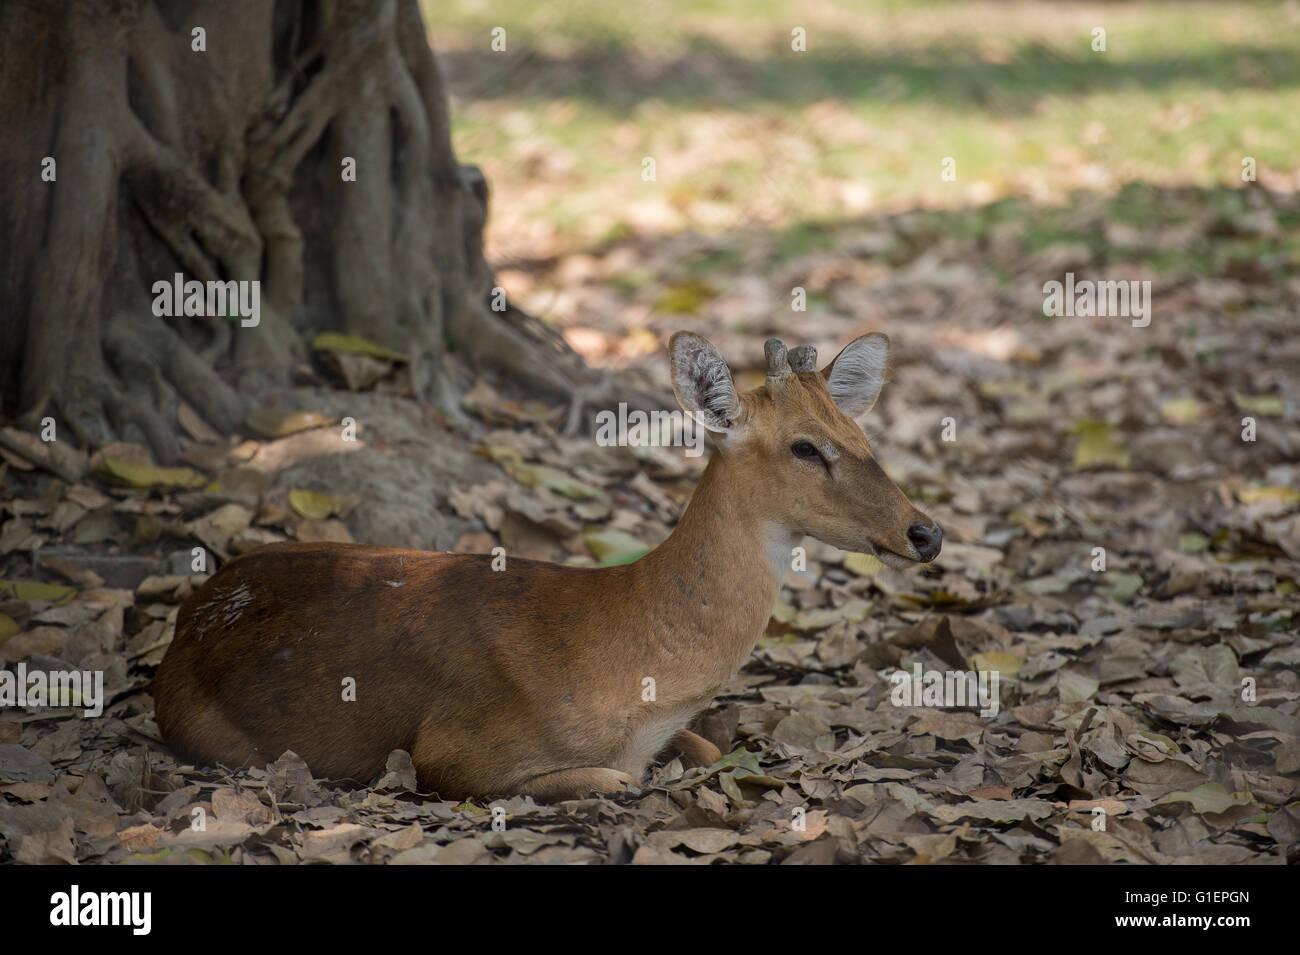 Femelle de Brown-chevreuil, Cervus eldii eldii,, cervidés, Inde, Asie Photo Stock